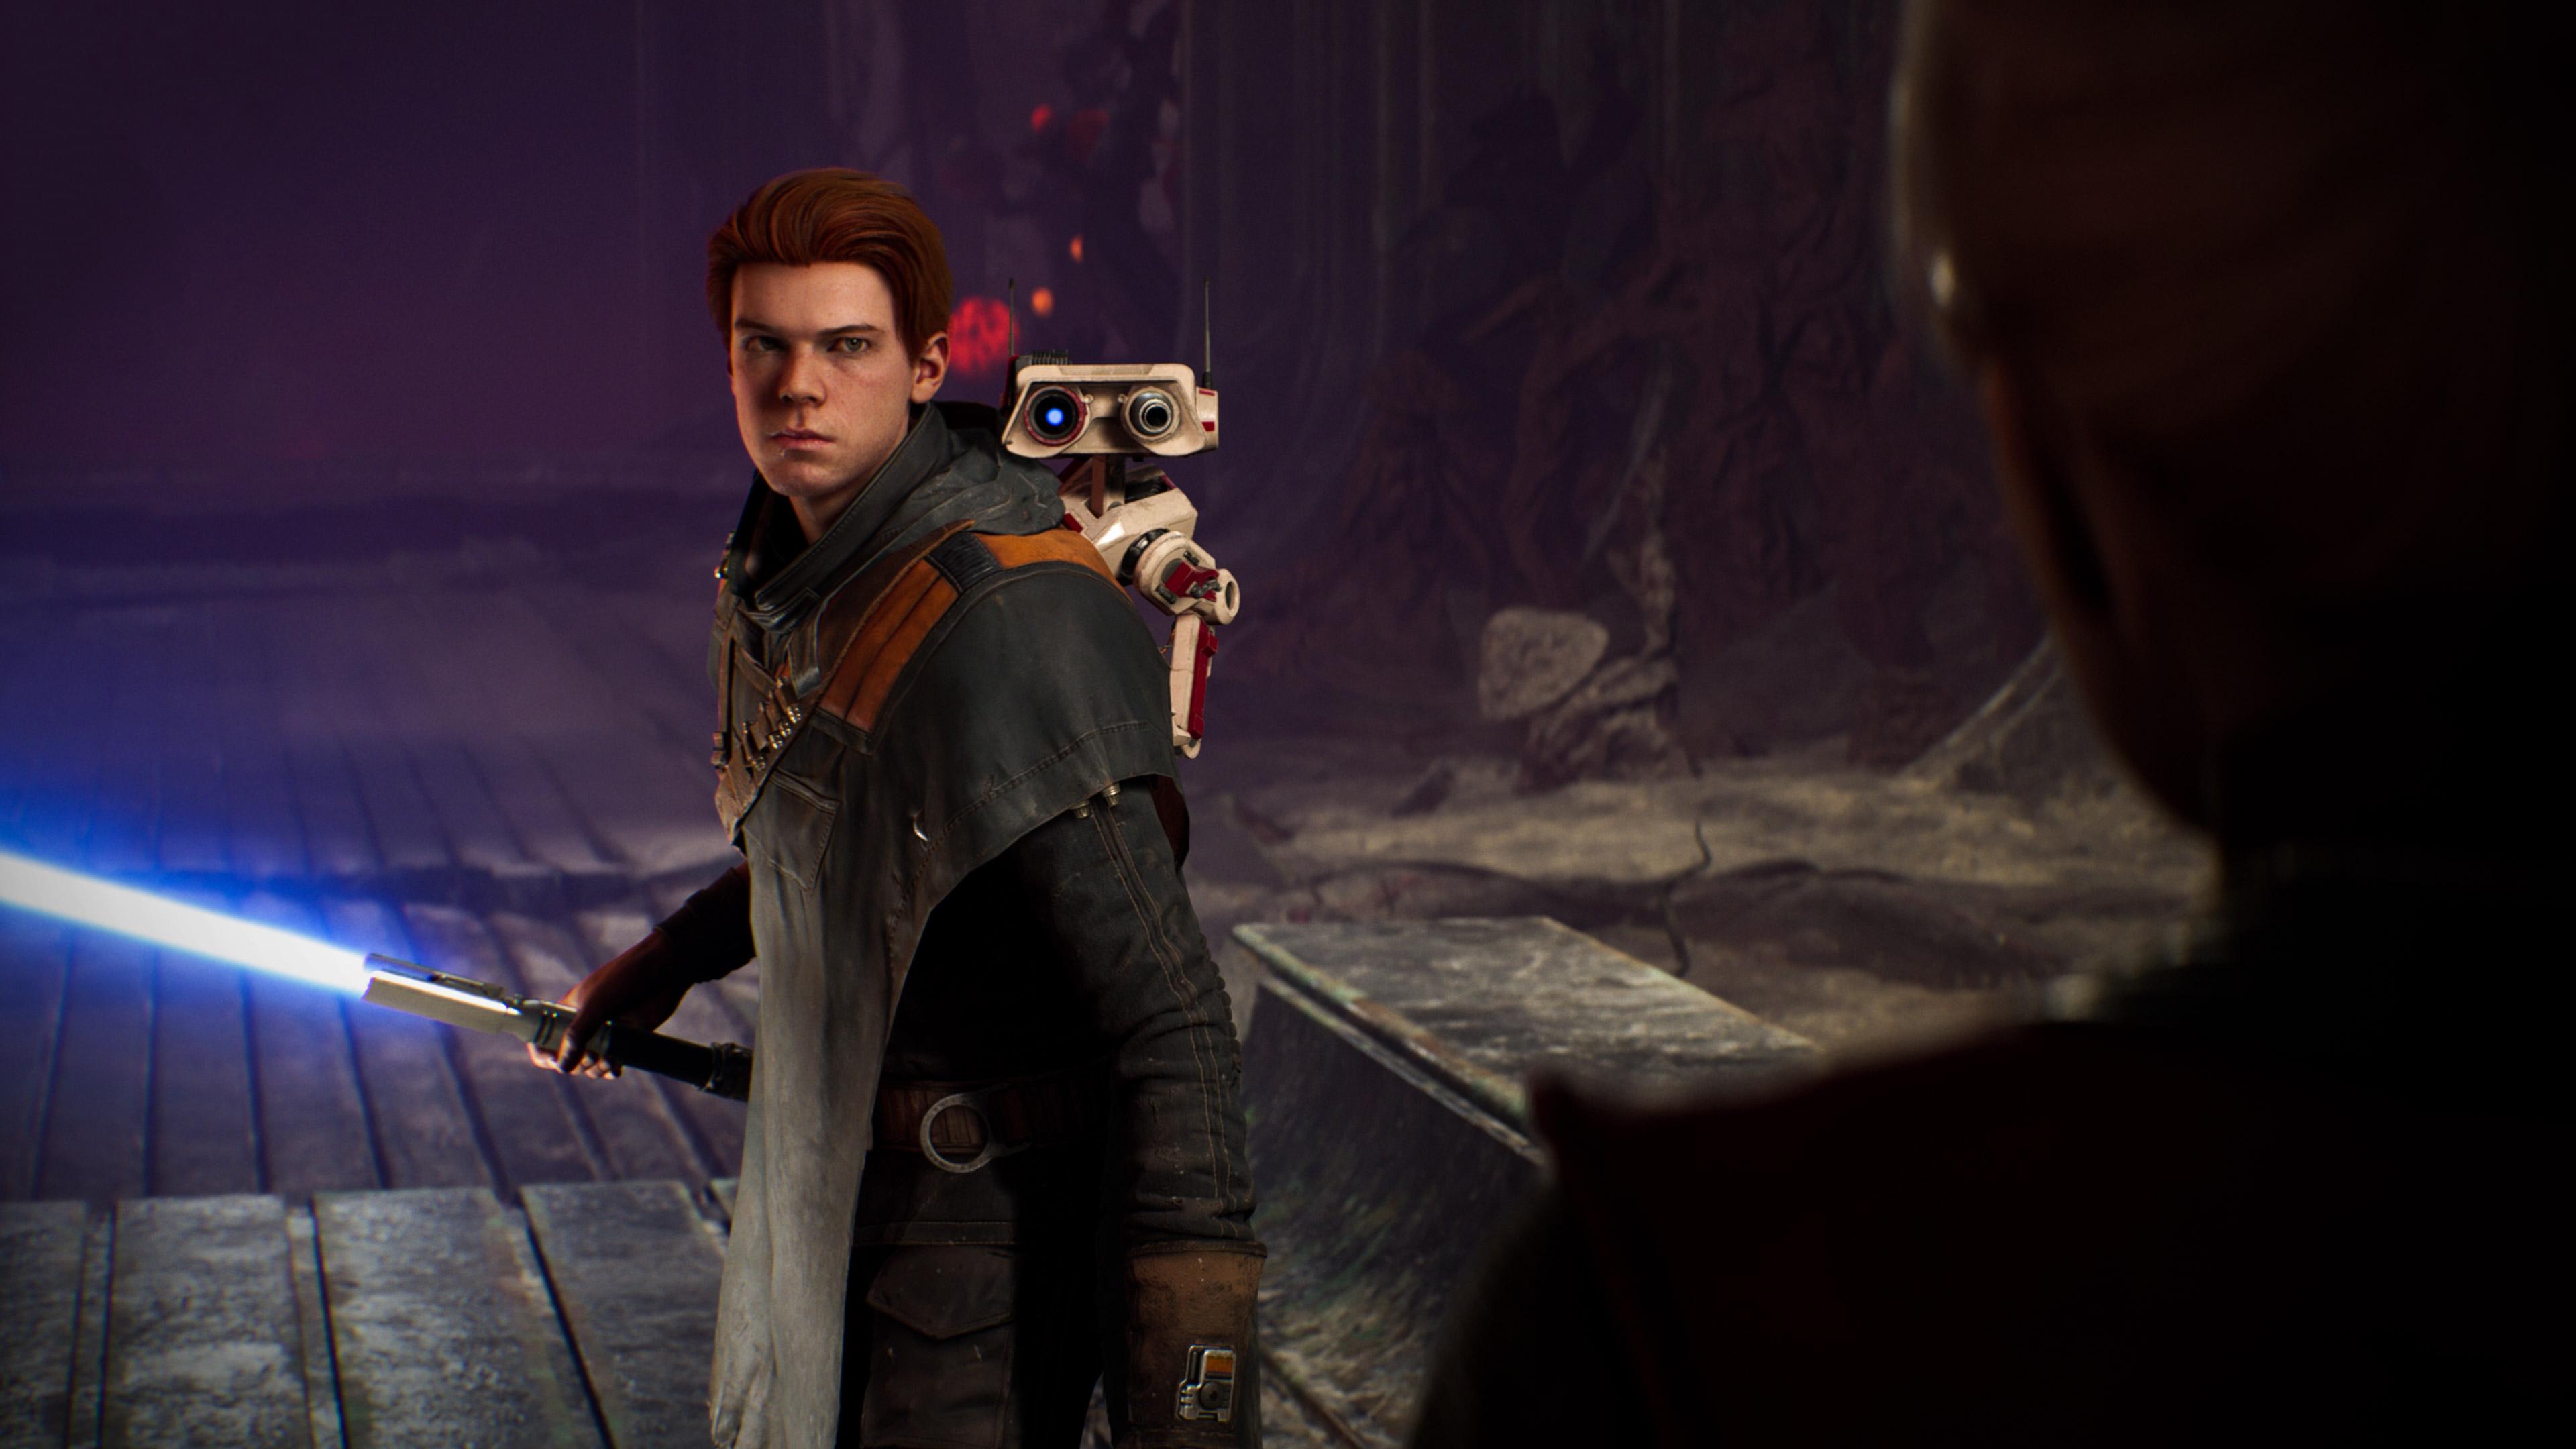 Star Wars Jedi: Fallen Order beginner's guide and tips